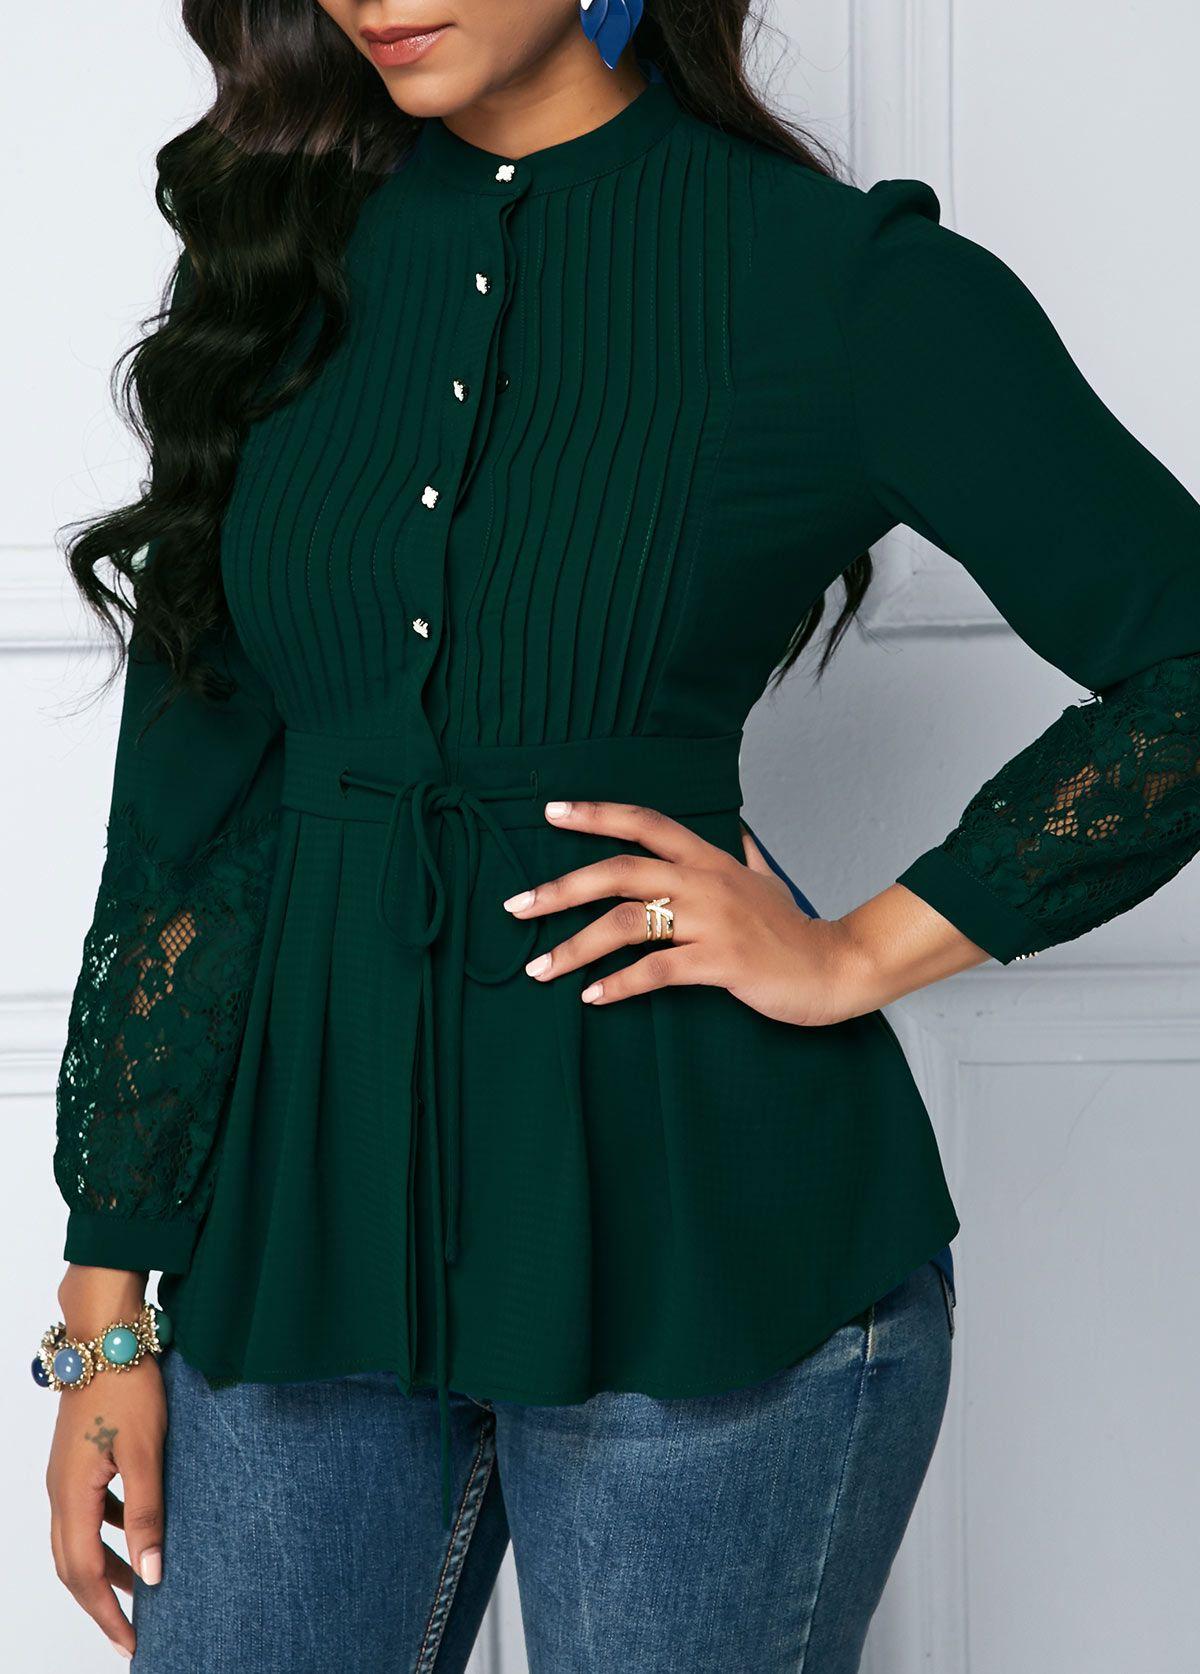 d582c29149d824 Crinkle Chest Lace Panel Dark Green Peplum Blouse | Rotita.com - USD $27.79